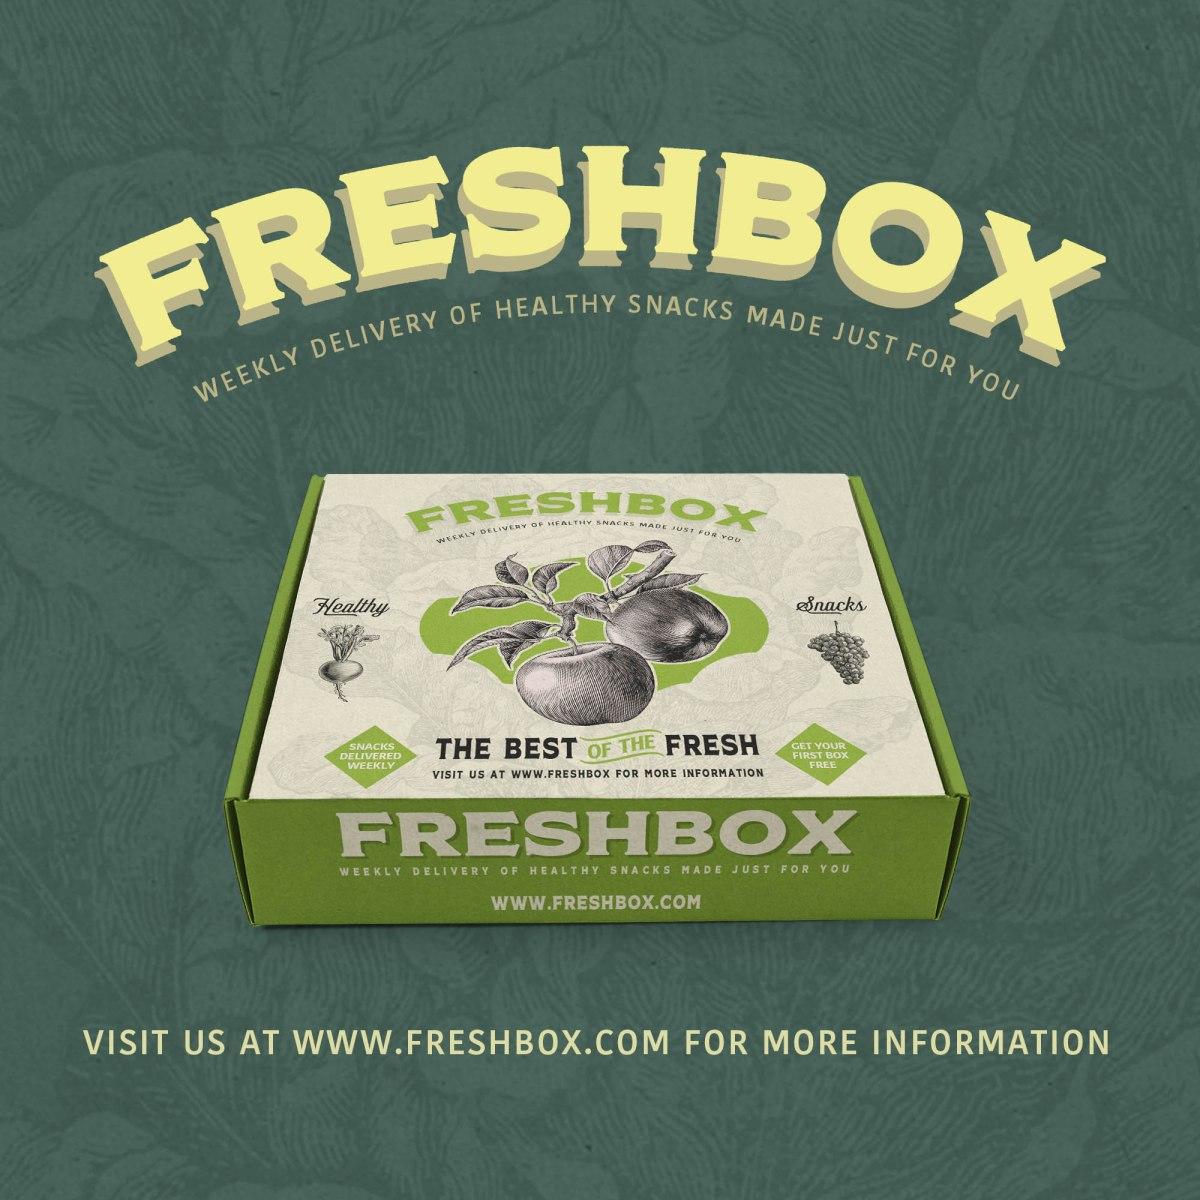 FreshBox Packaging.